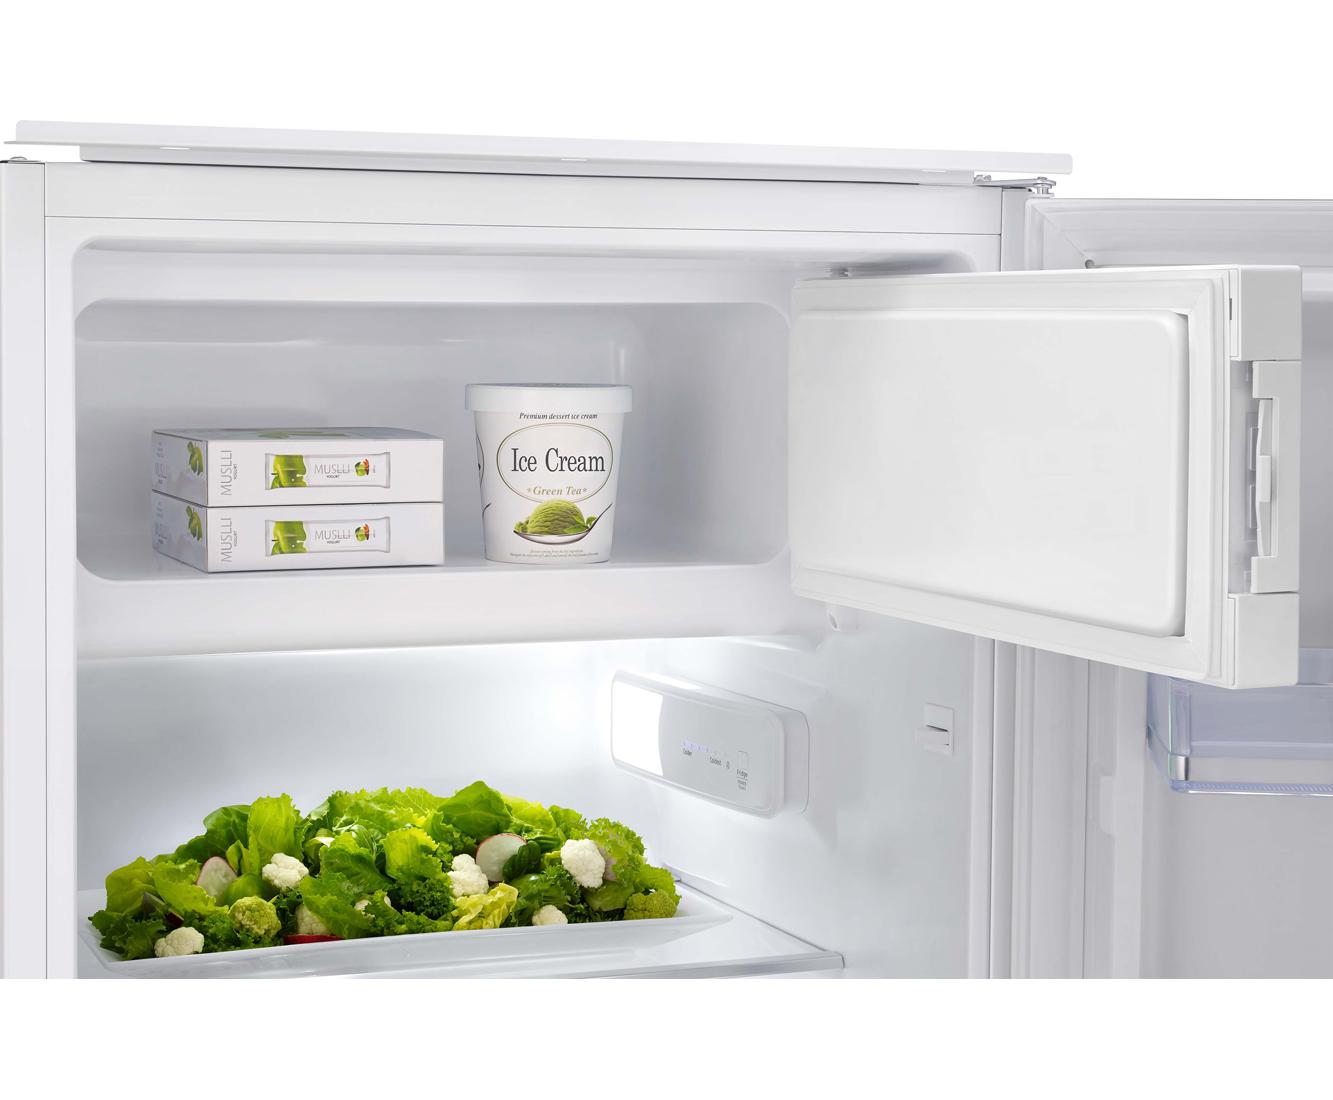 Kühlschrank Samsung : Samsung a side by side kühlschrank no frost technik abholung in